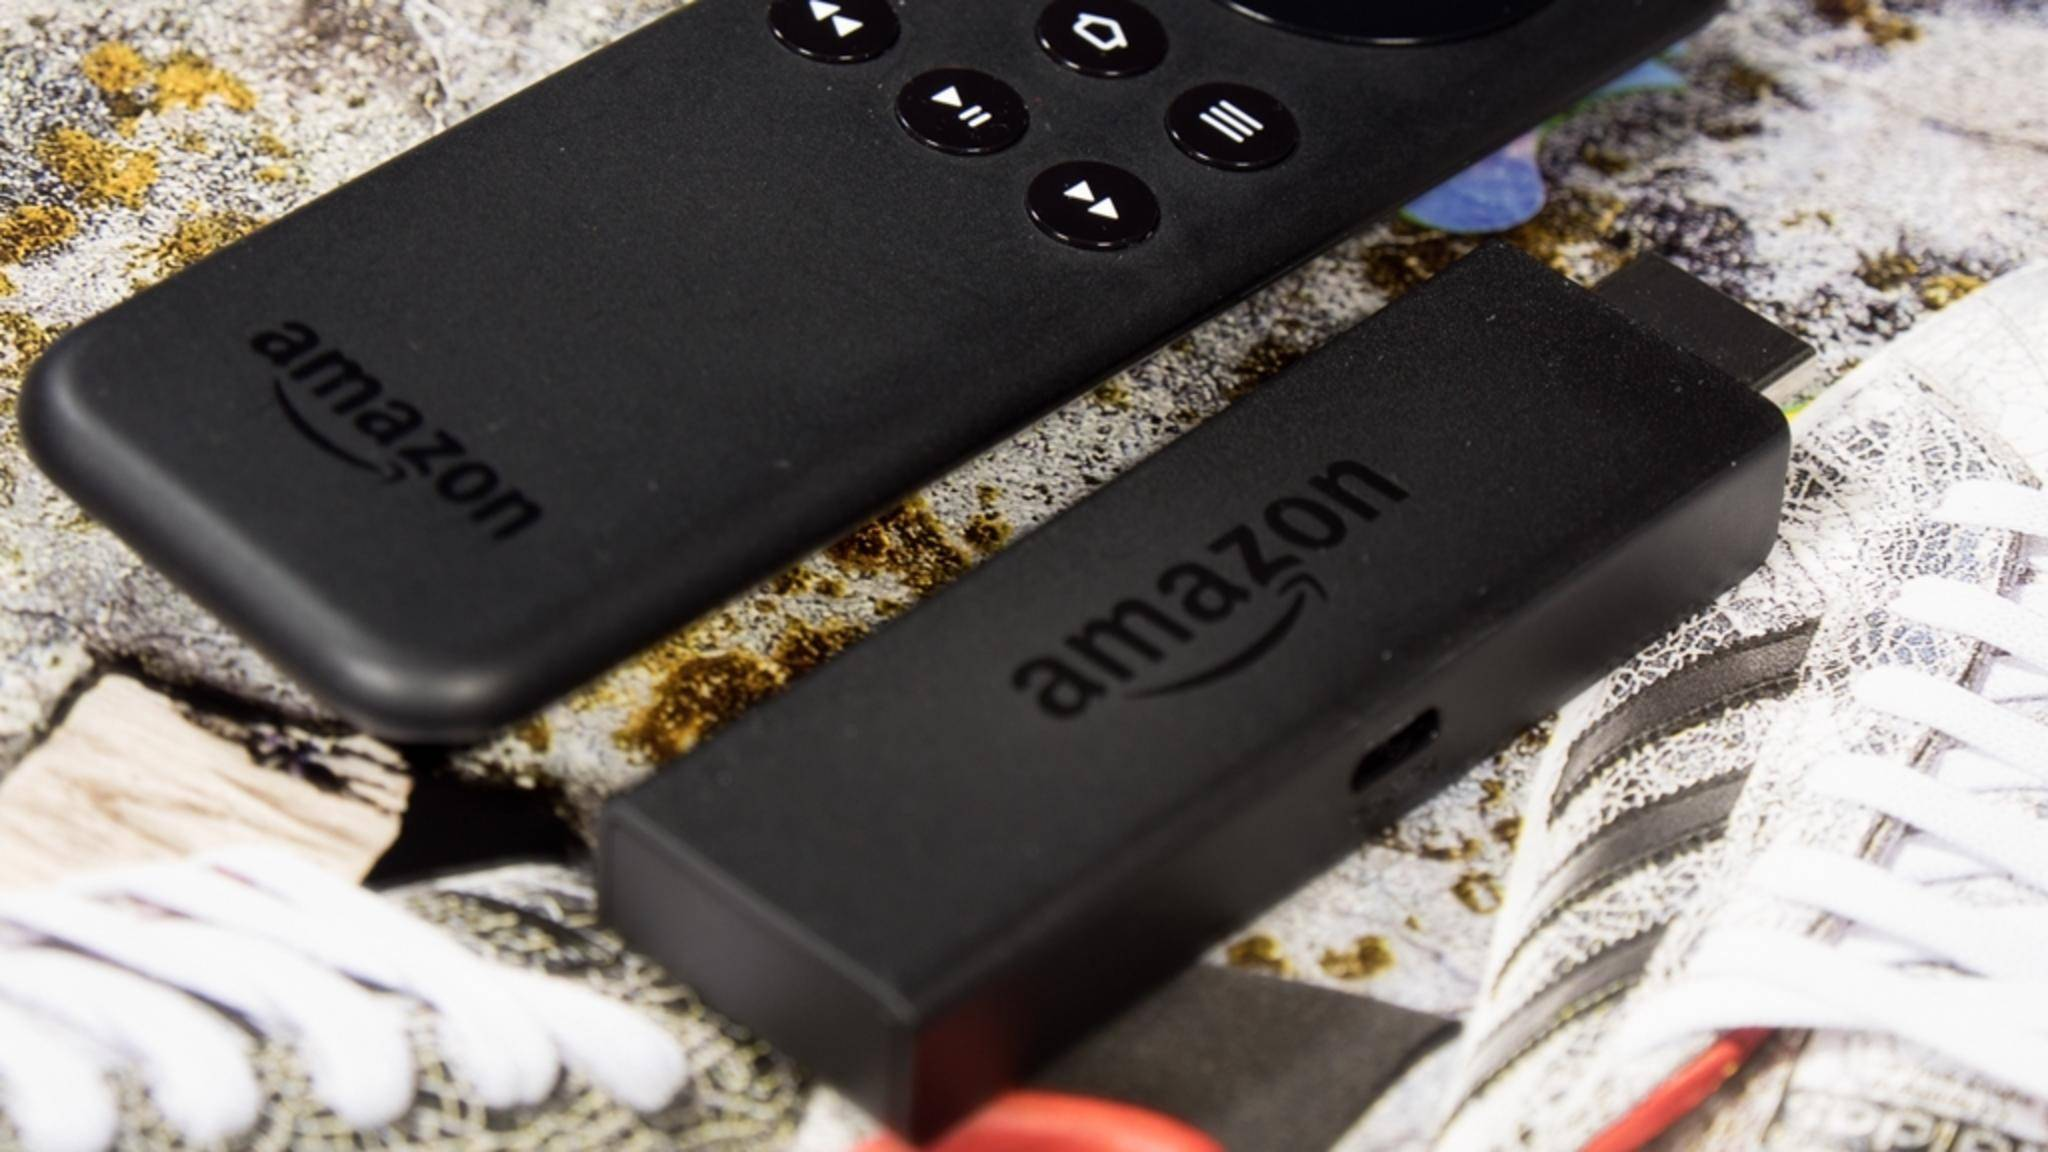 YouTube auf Amazon Fire TV (Stick) nutzen: So geht's mit Kodi